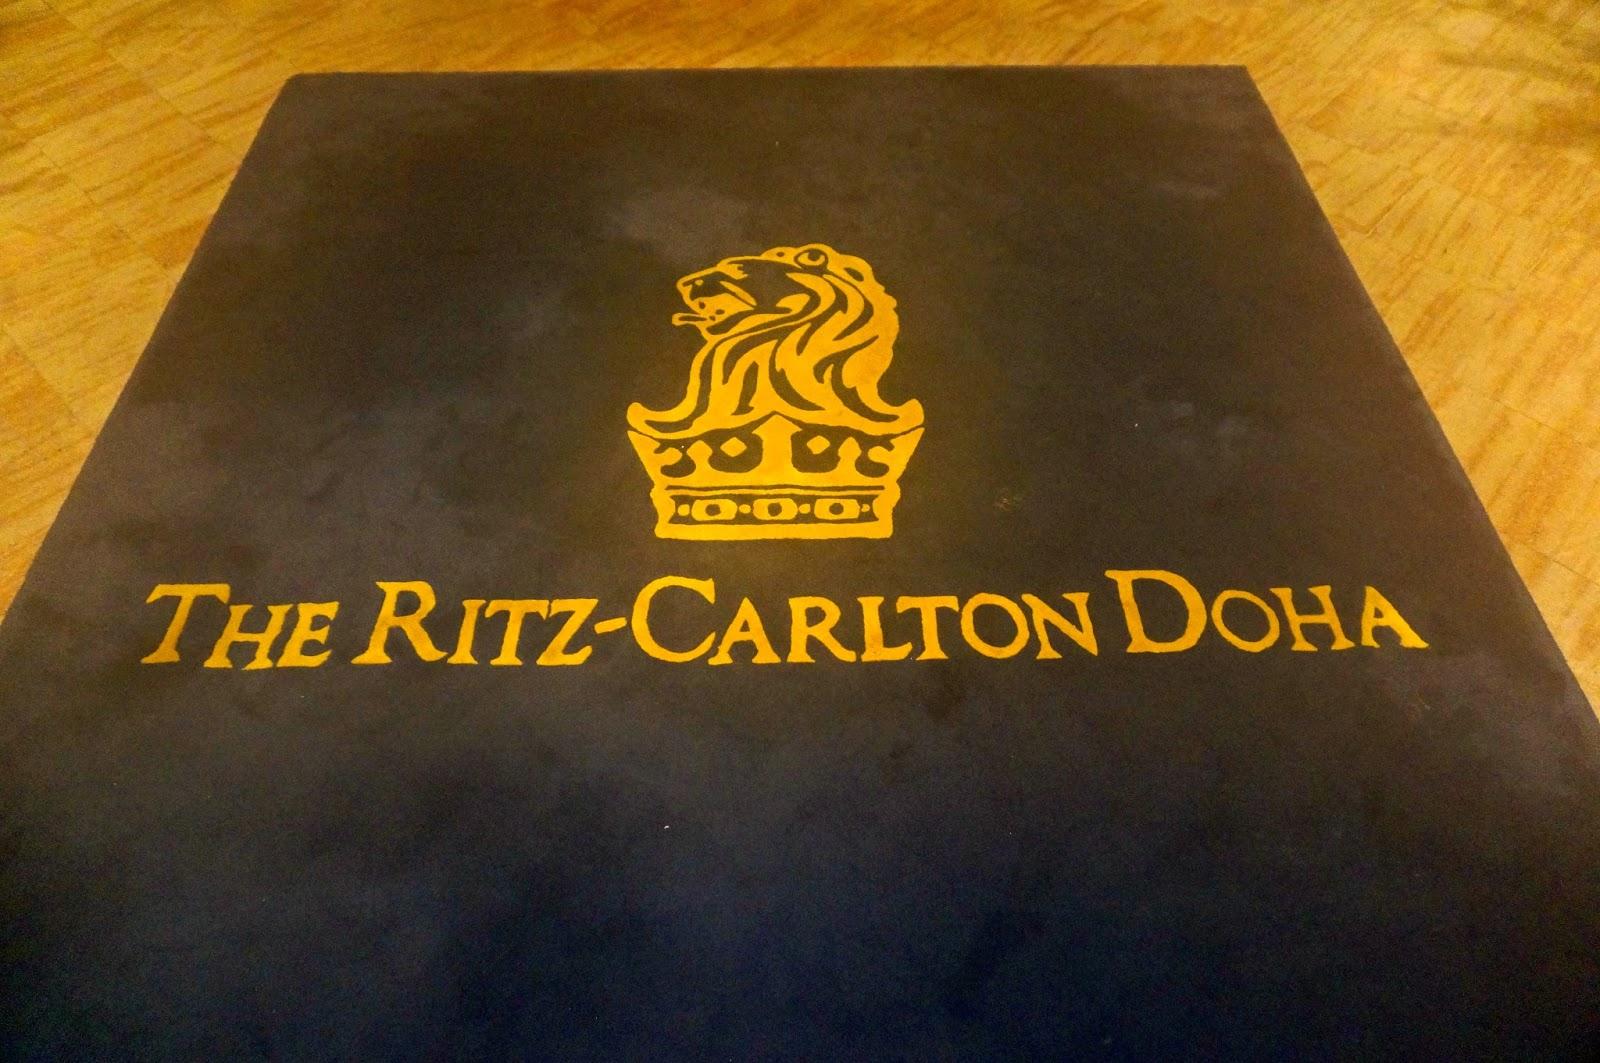 A New Favourite Restaurant: Porcini at the Ritz Carlton, Doha